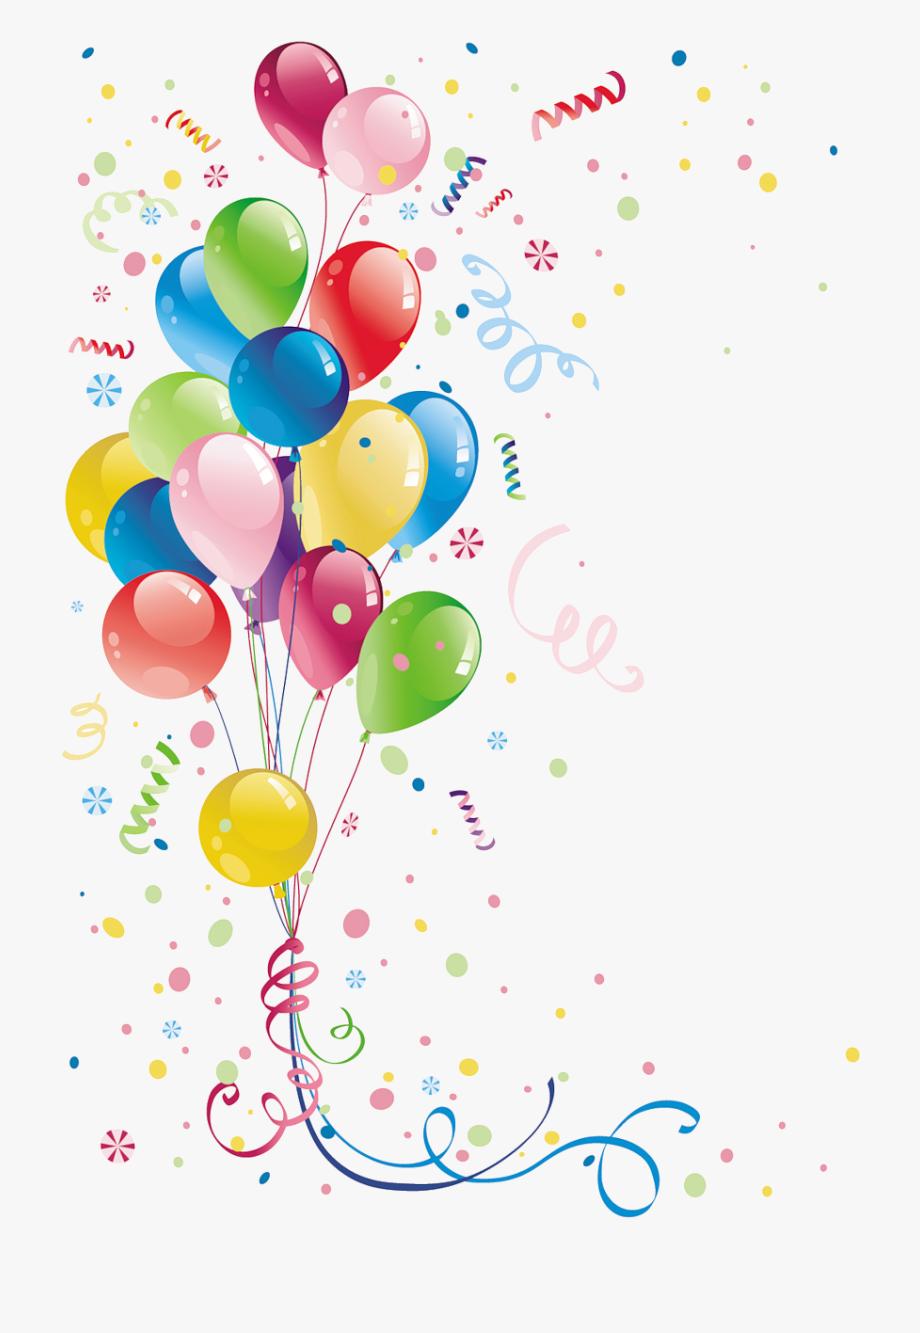 Balloon clipart ballon. Confetti and balloons ribbons